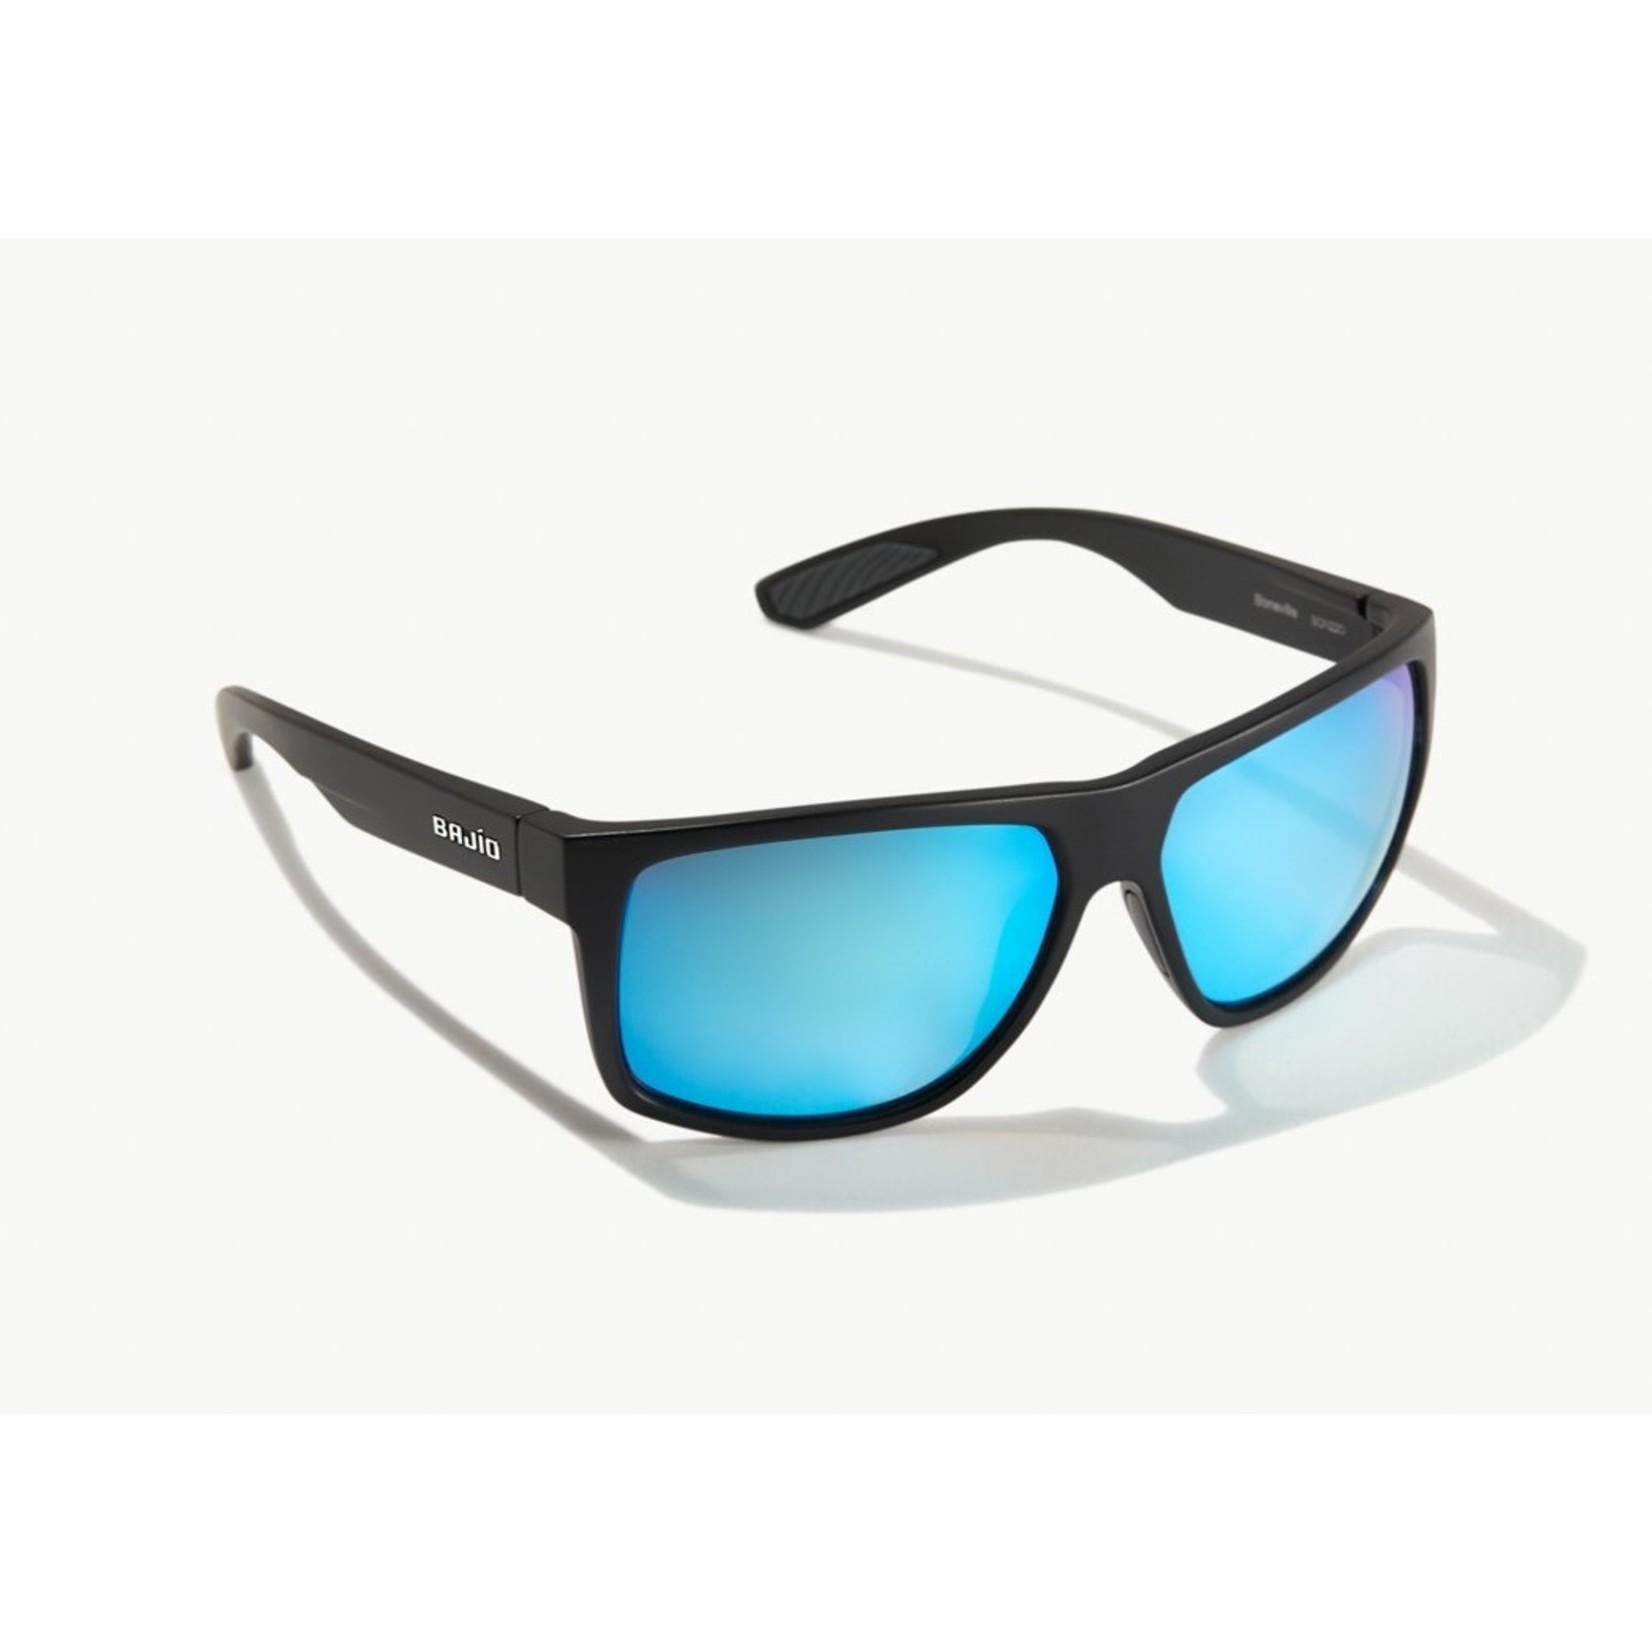 Bajio Bajio Boneville Polarized Sunglasses